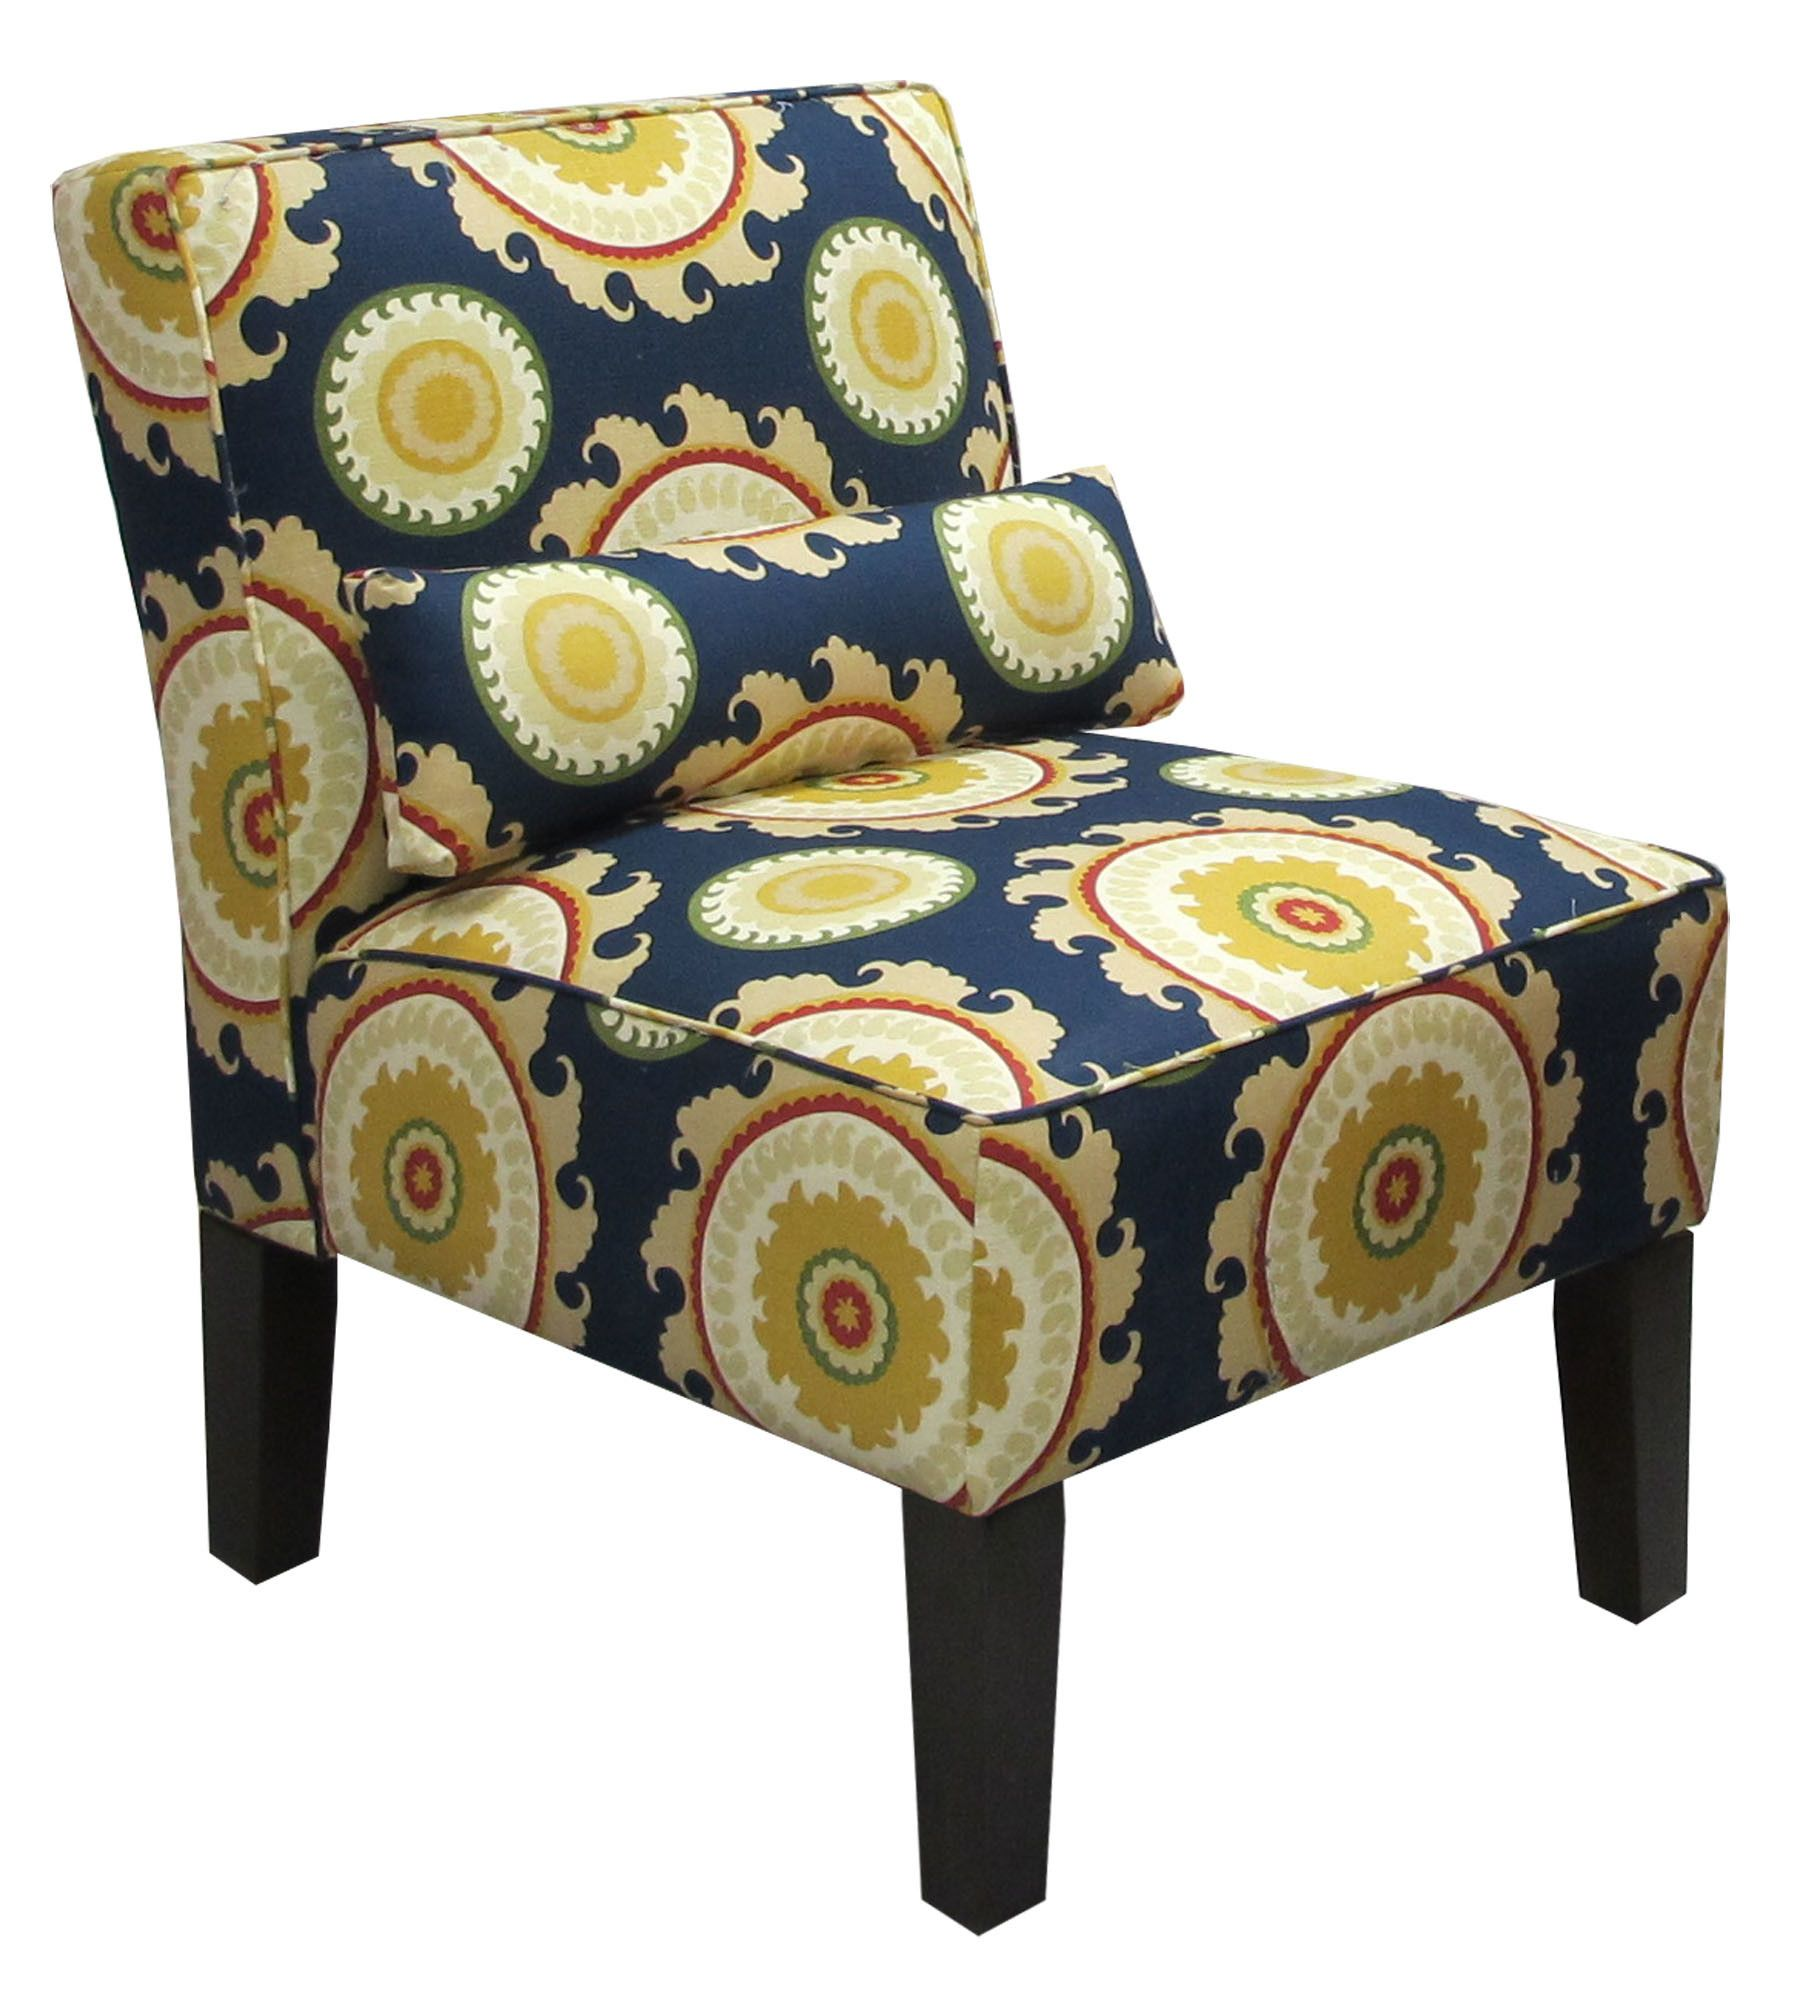 Skyline Furniture Upholstered Fabric Slipper Chair